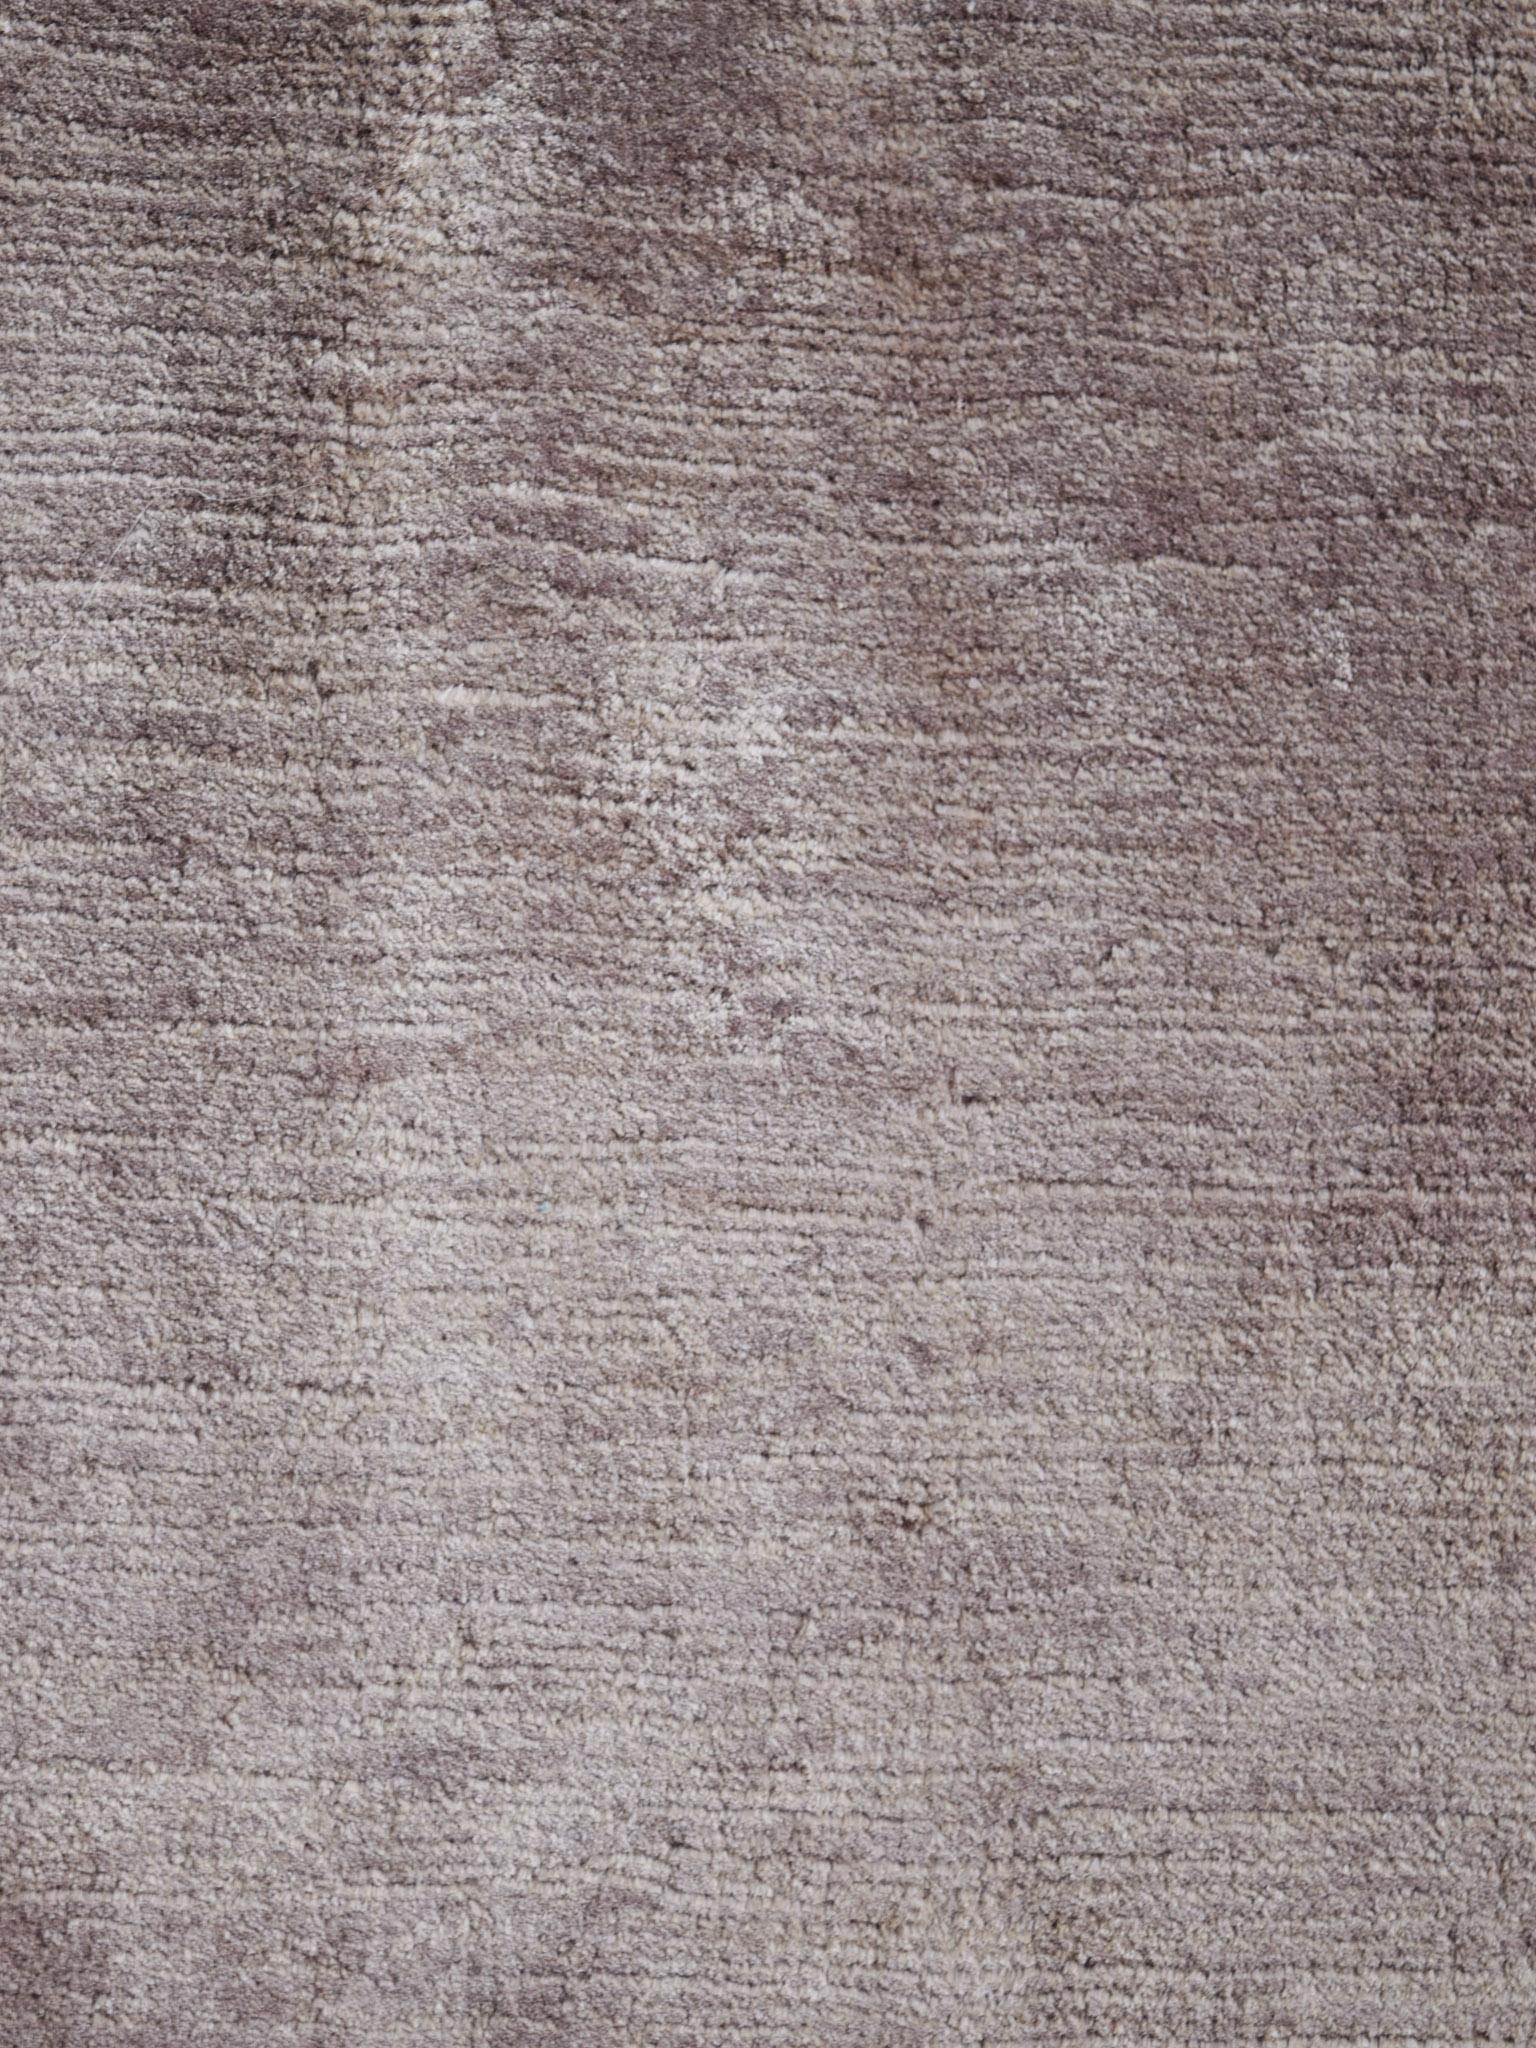 Muga Silk Solid HSPSA16113/315